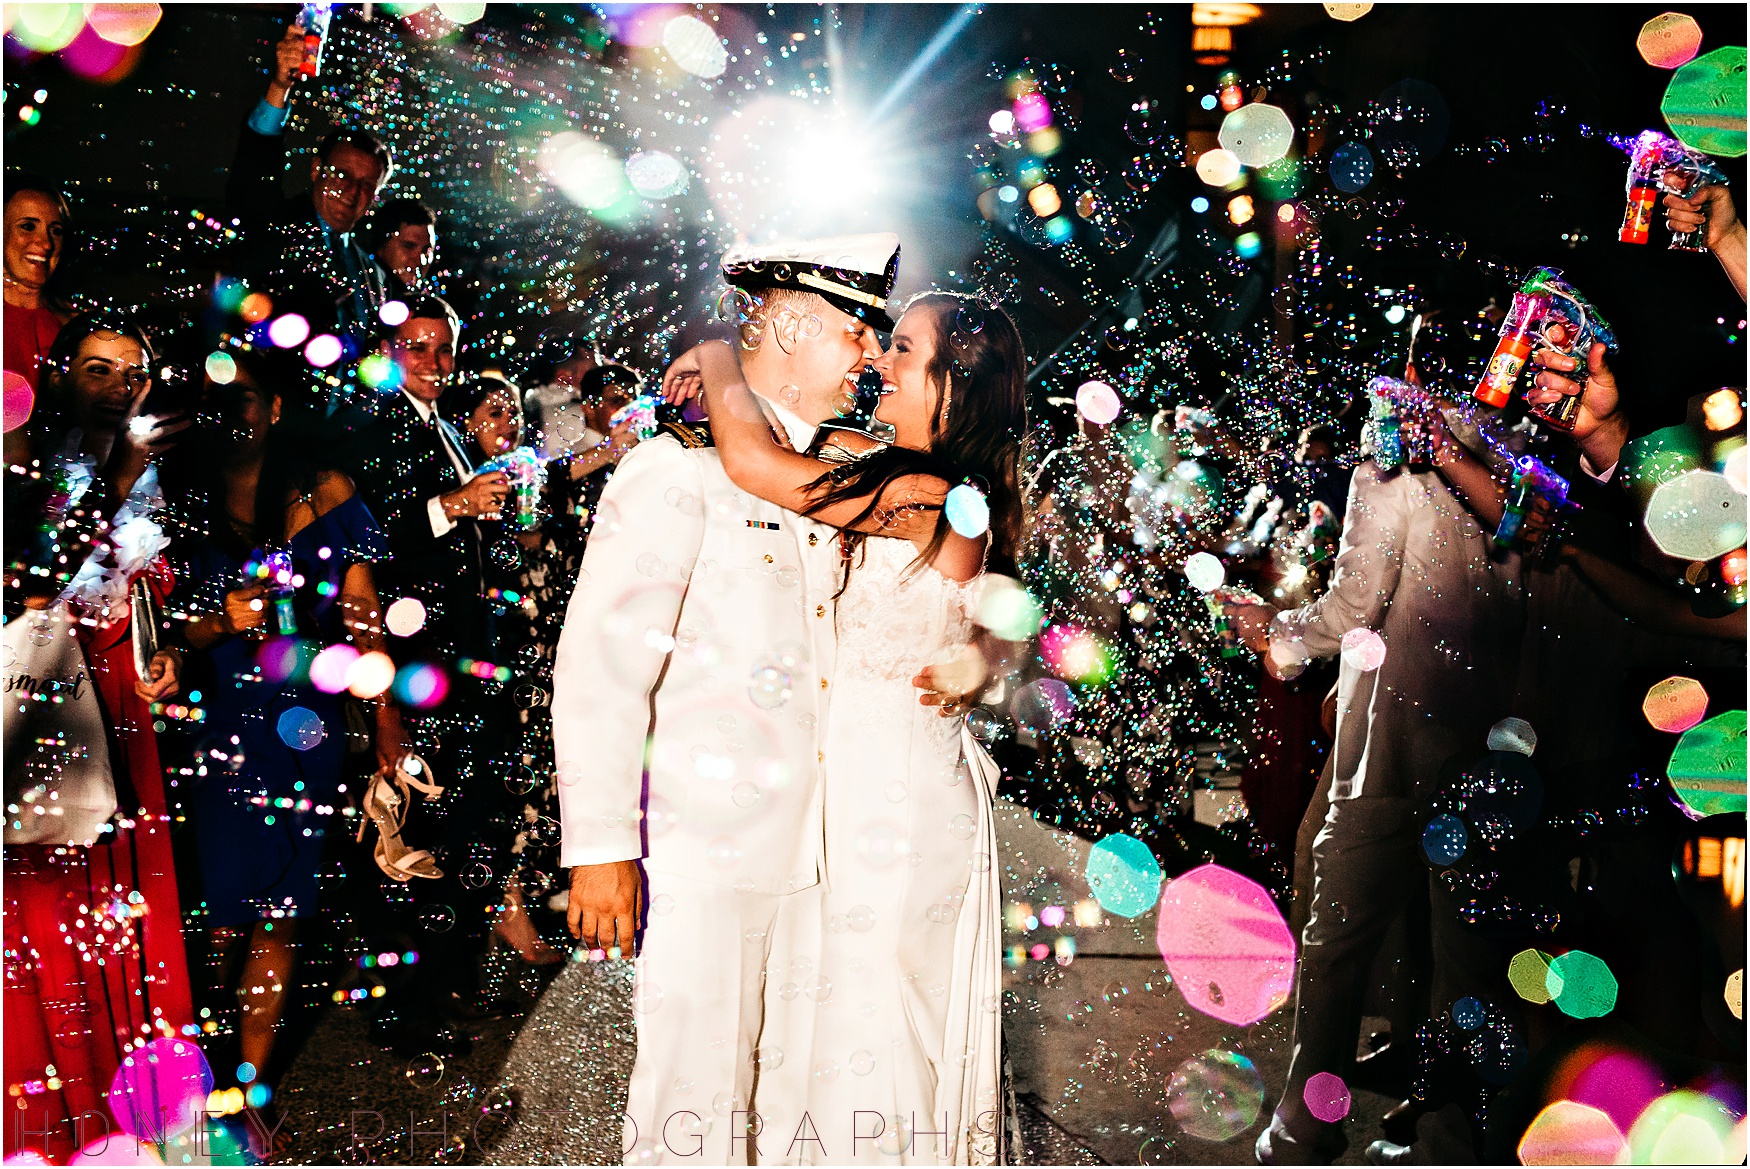 bali-hai-tropical-bubble-exit-party-paradise-wedding075.jpg